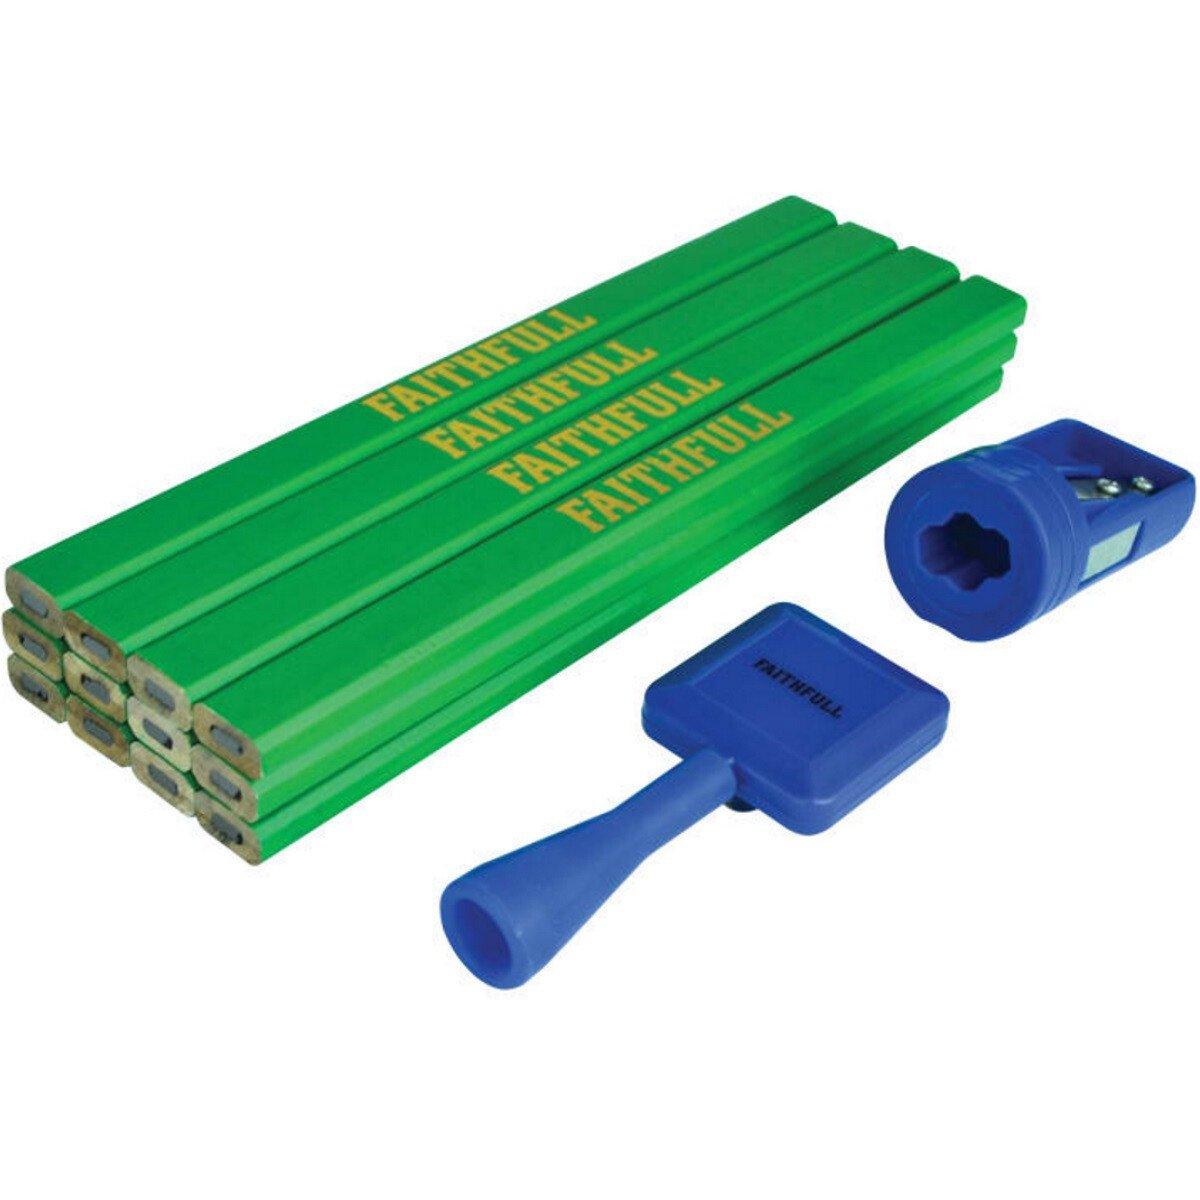 Faithfull FAICPGKIT Carpenter's Pencil Kit Green / Hard (Pack 12)